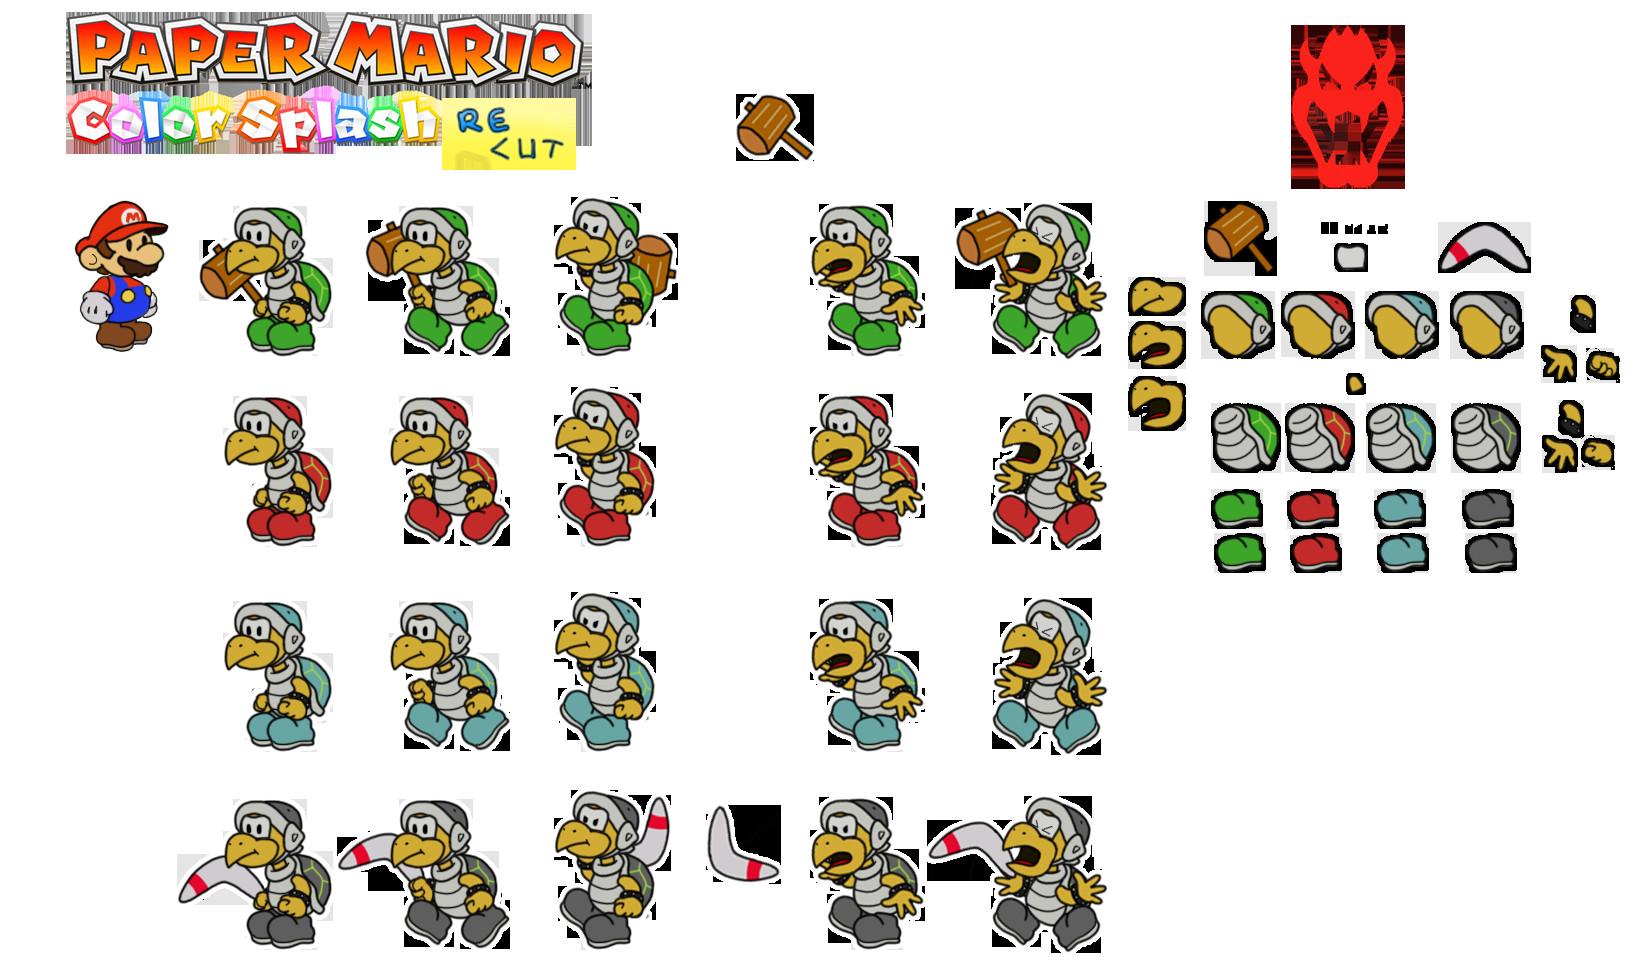 Paper Mario Color Splash Card Slots Paper Mario Color Splash Recut Act 1 Spoilers for First